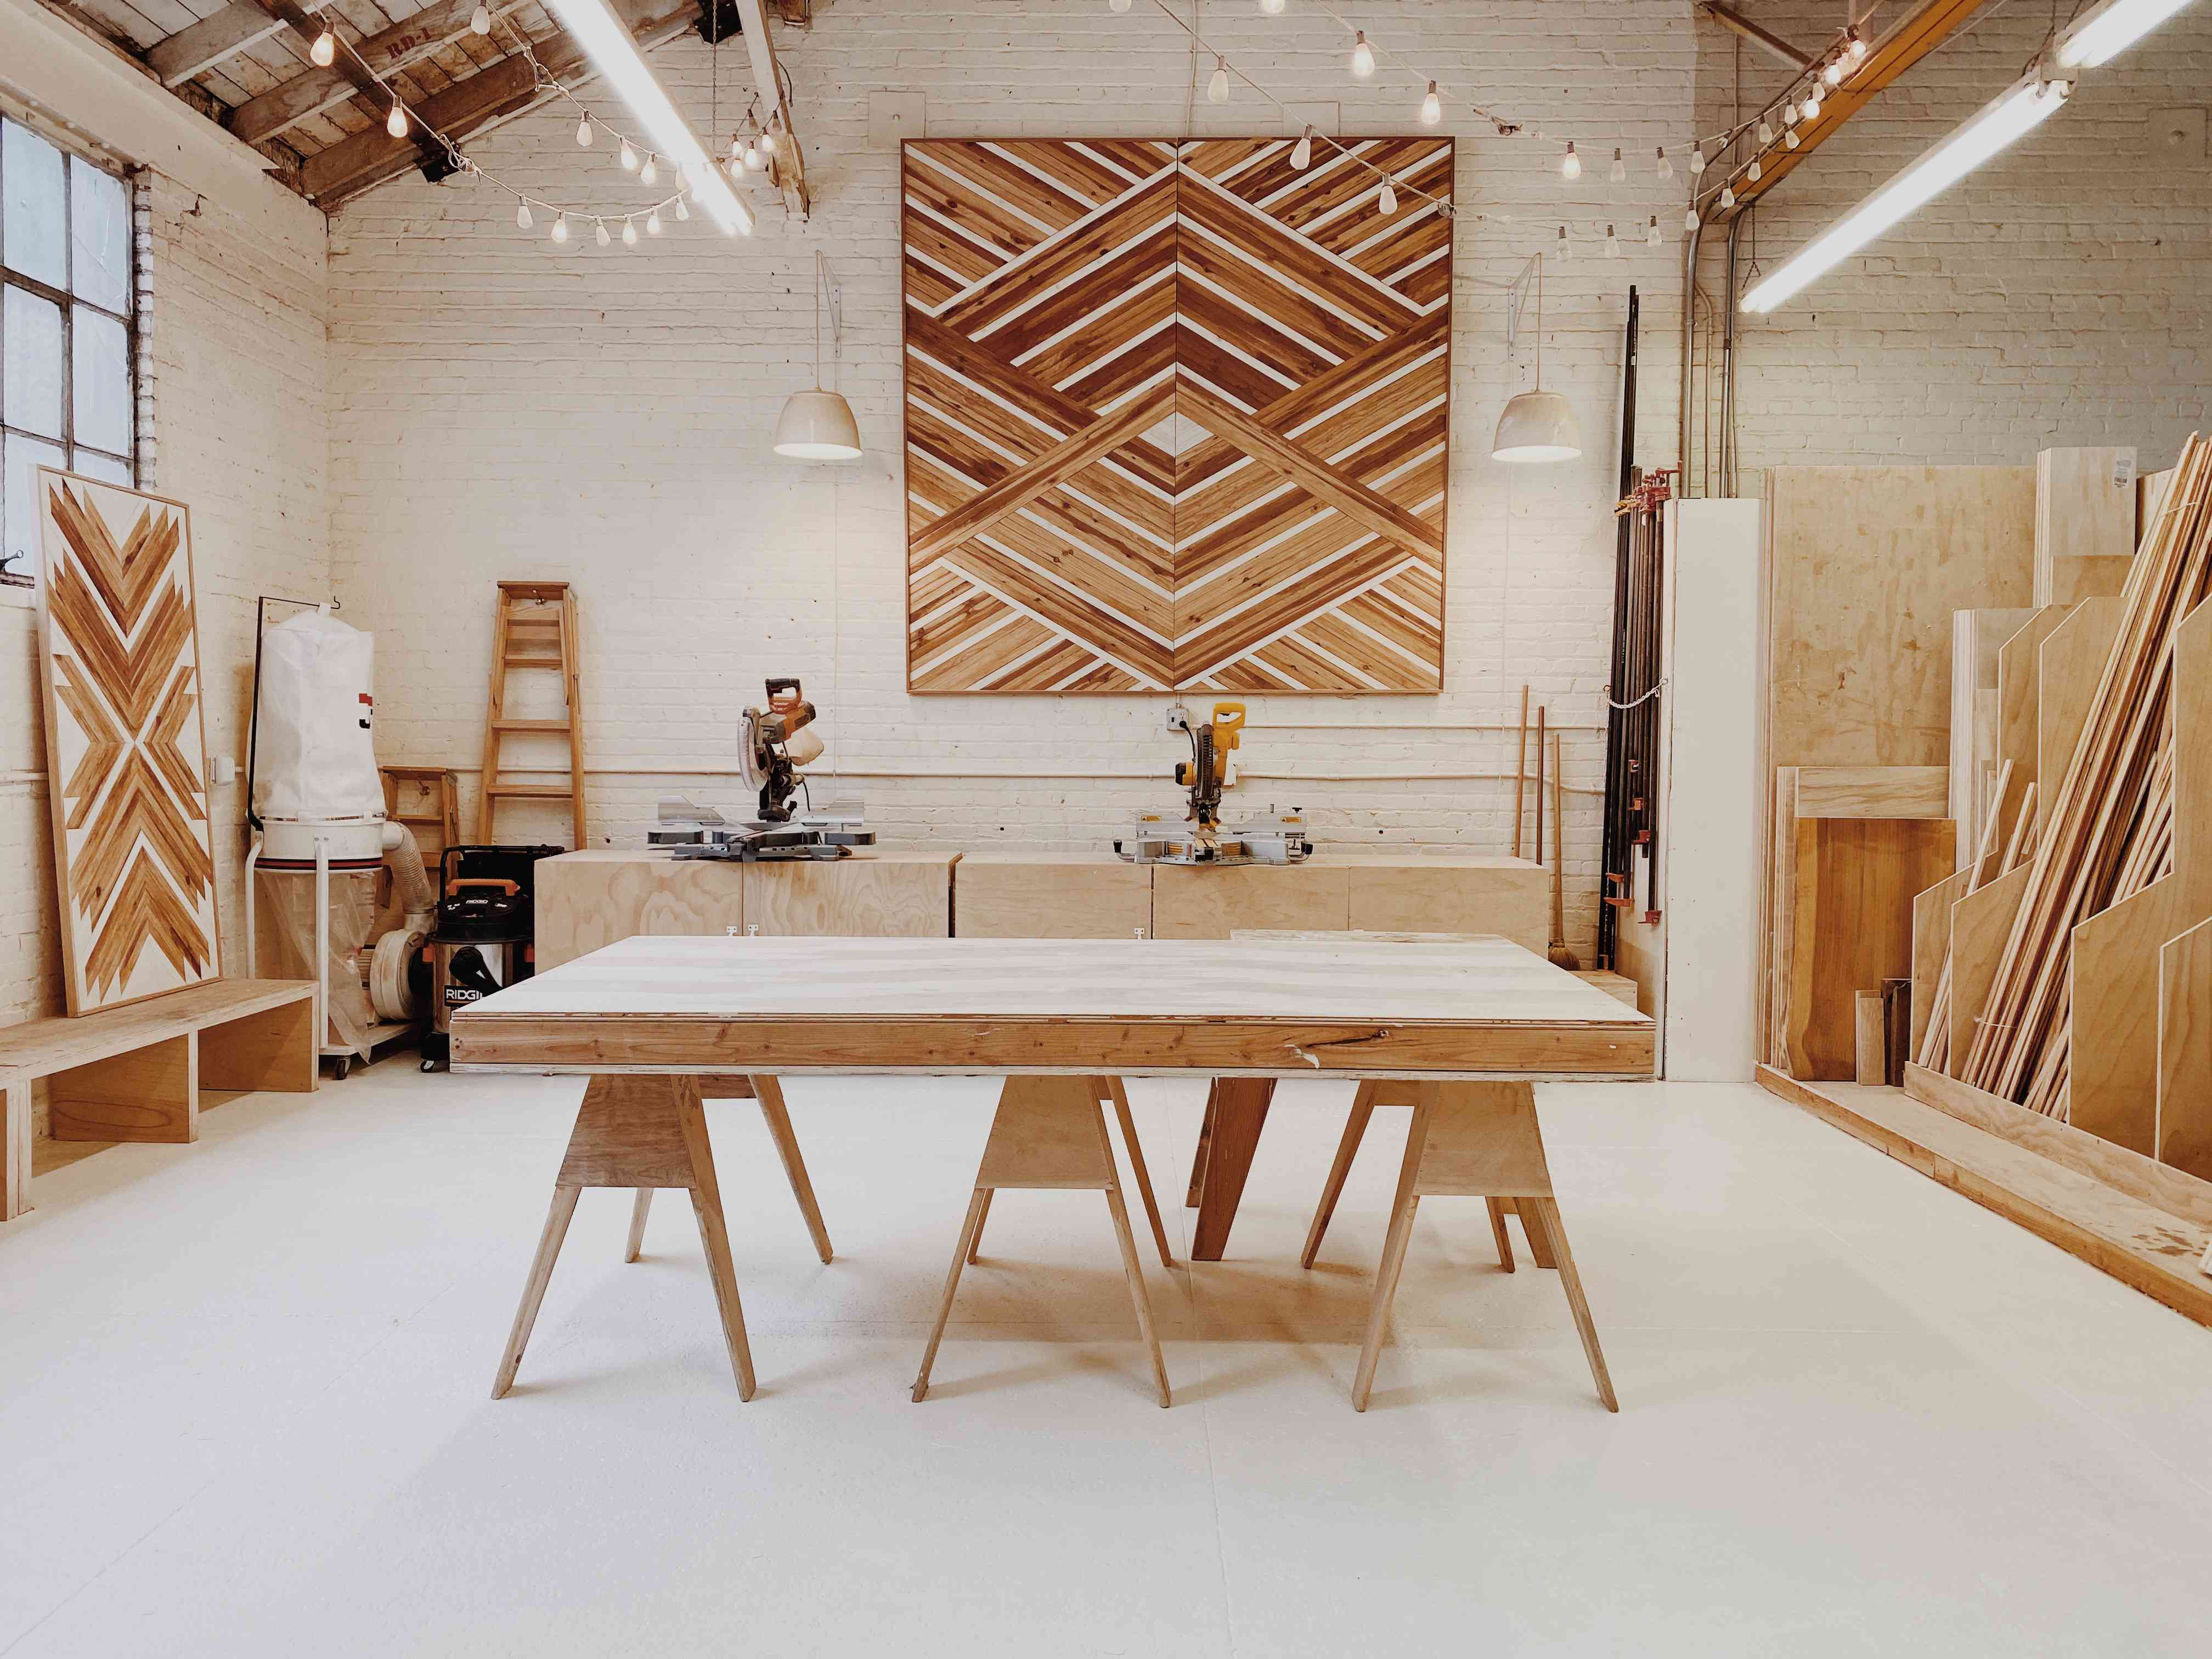 Aleksandra Zee's workshop